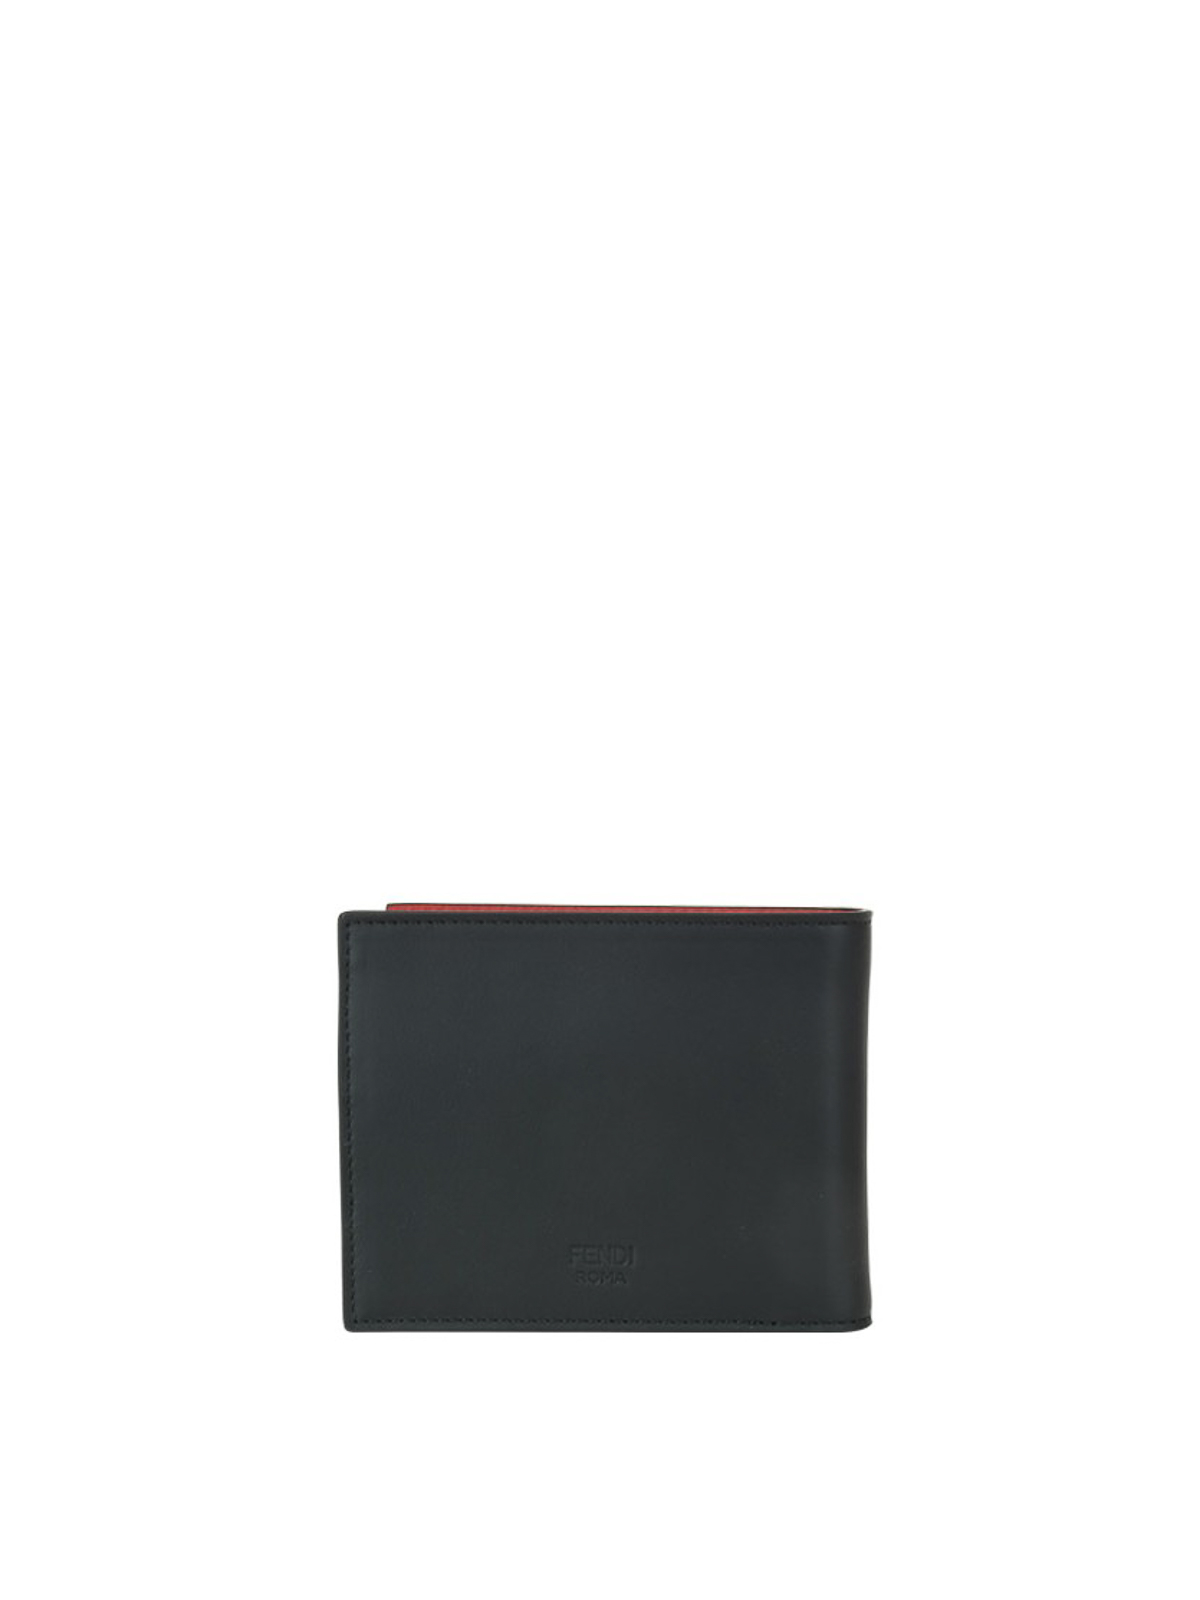 37676e223a iKRIX FENDI: wallets & purses - Bag Bugs leather bi-fold wallet